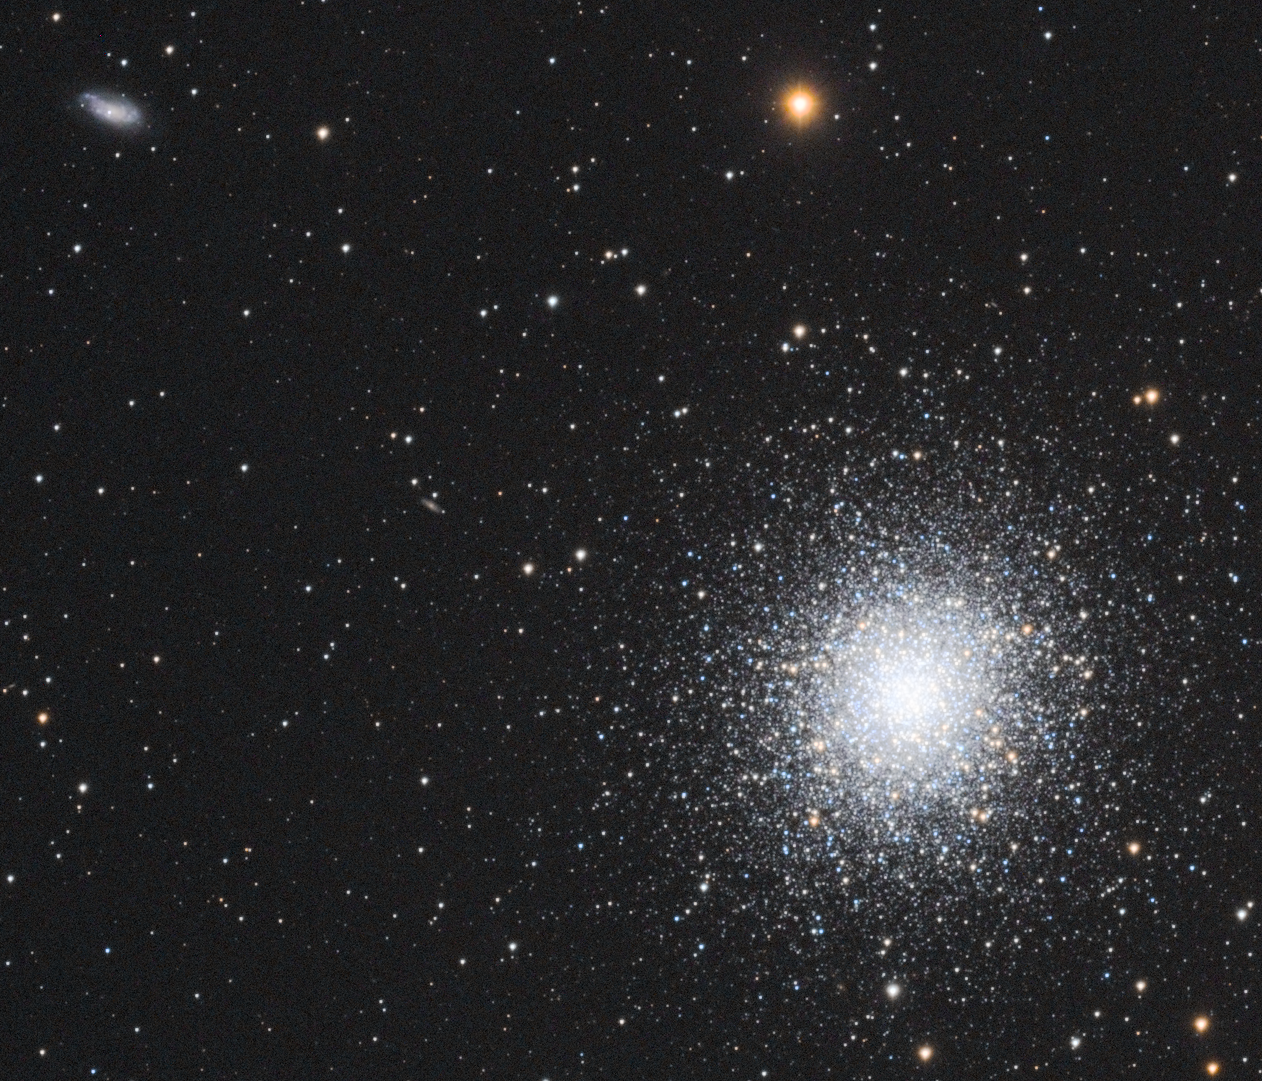 M13LRVB_et_NGC6207_crop_120%25.png.19cafd67022c424462b3743b9190c0fa.png